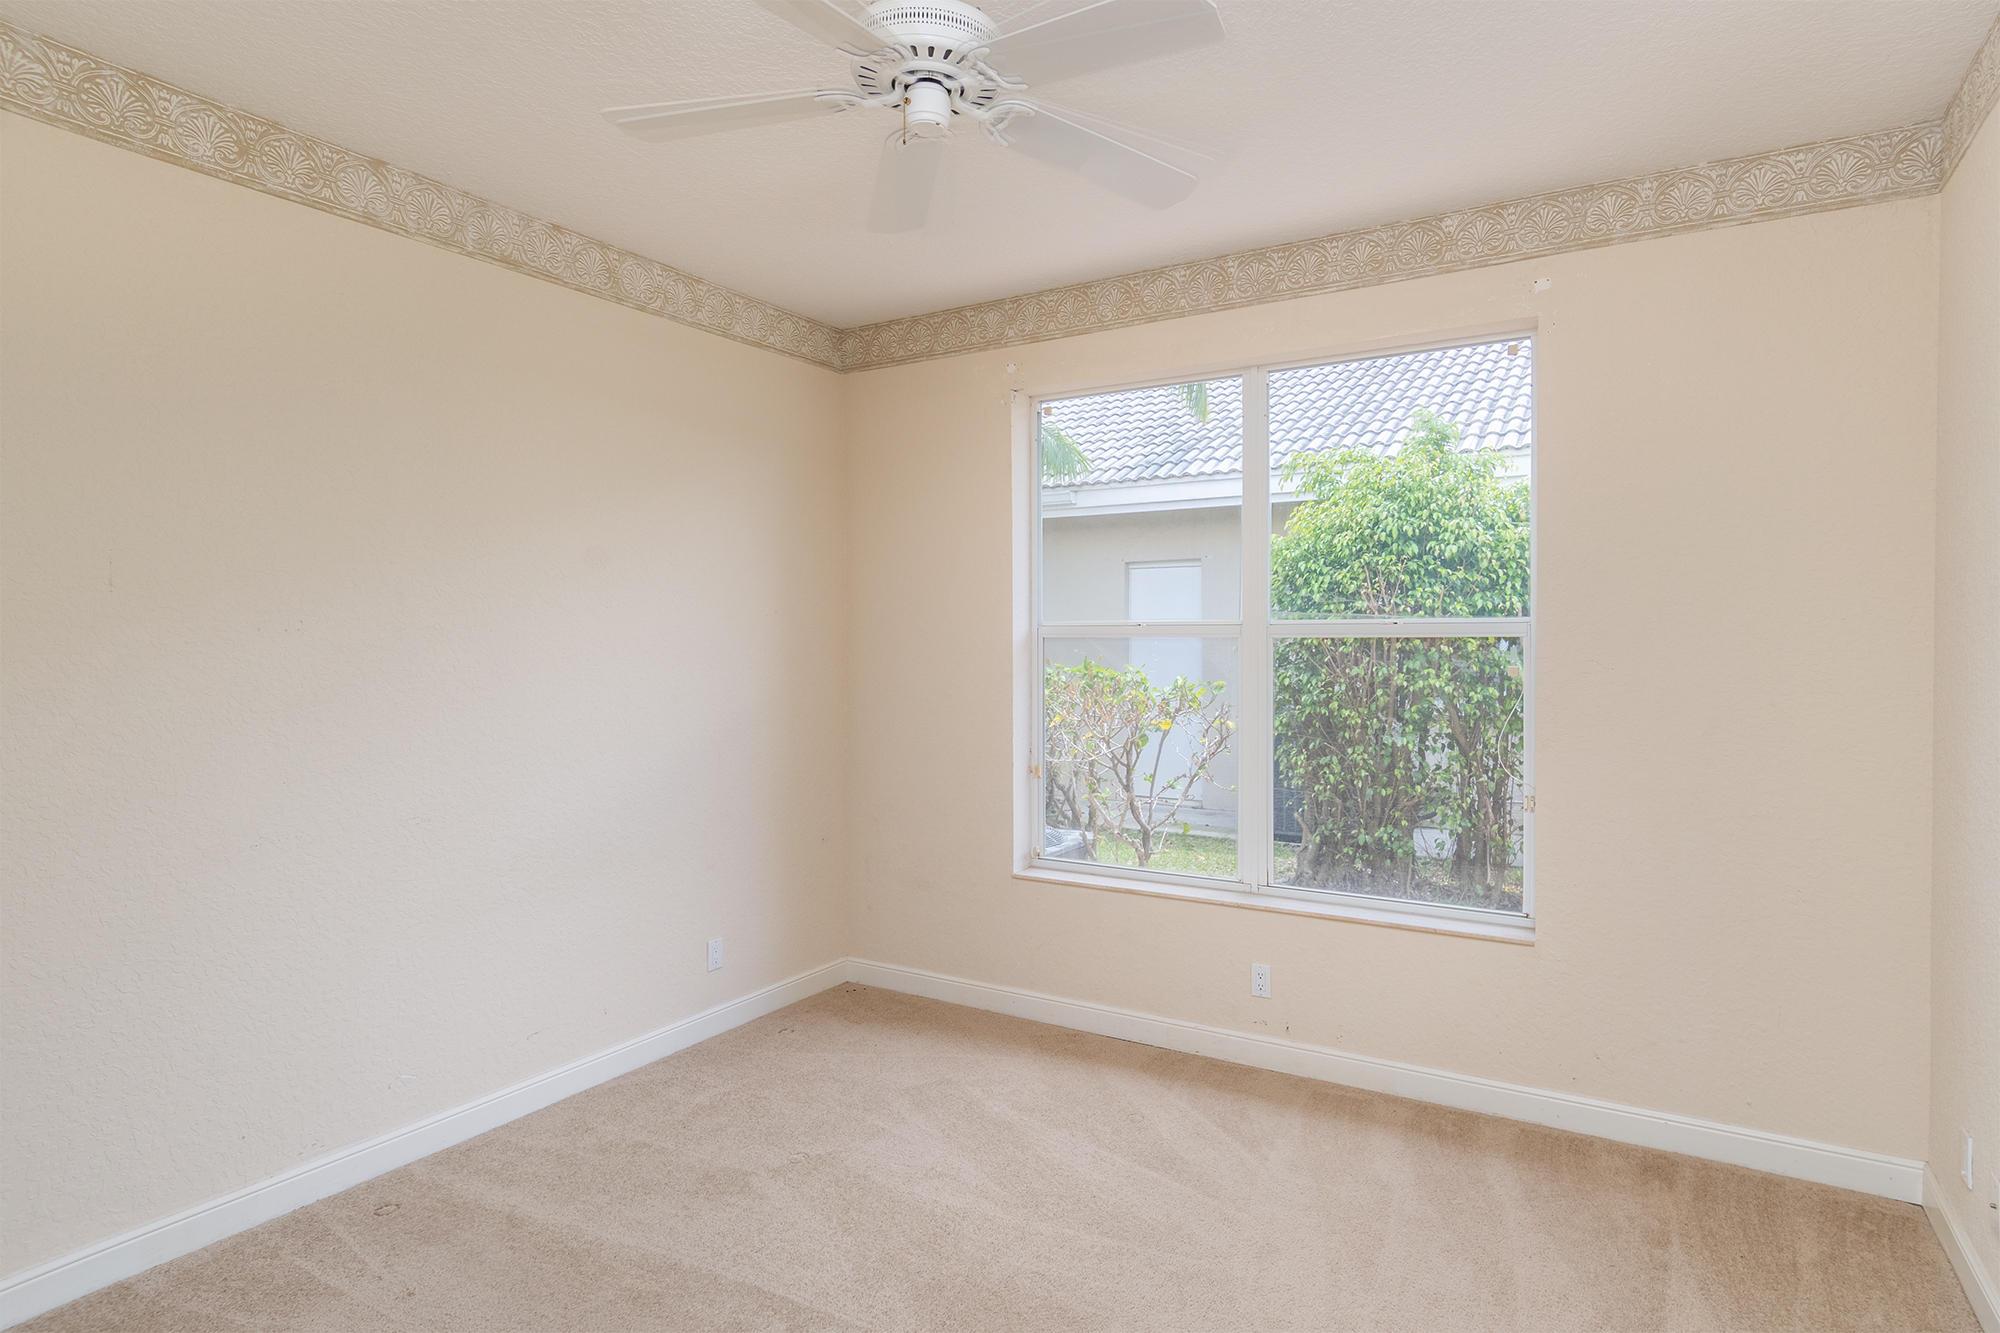 6269 Nw 33rd Avenue, Boca Raton, FL 33496